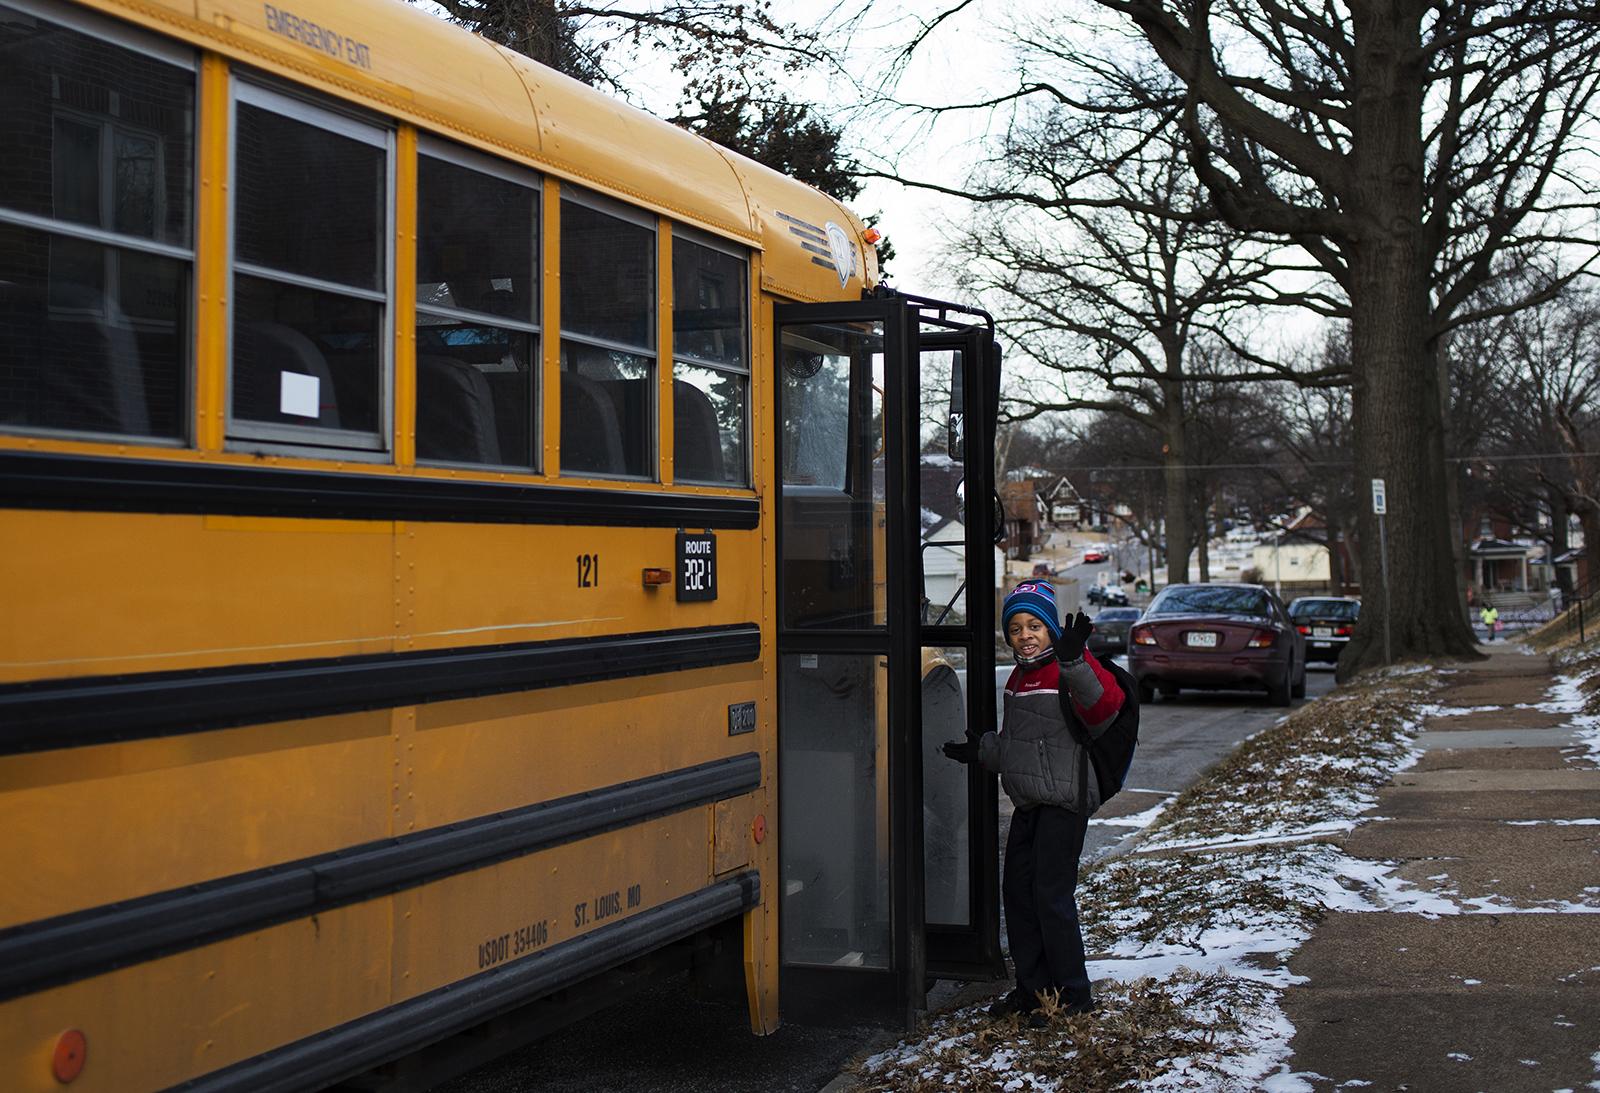 Johnny waves goodbye to his mom, Keyanna, as he boards the bus to school. CAROLINA HIDALGO   ST. LOUIS PUBLIC RADIO